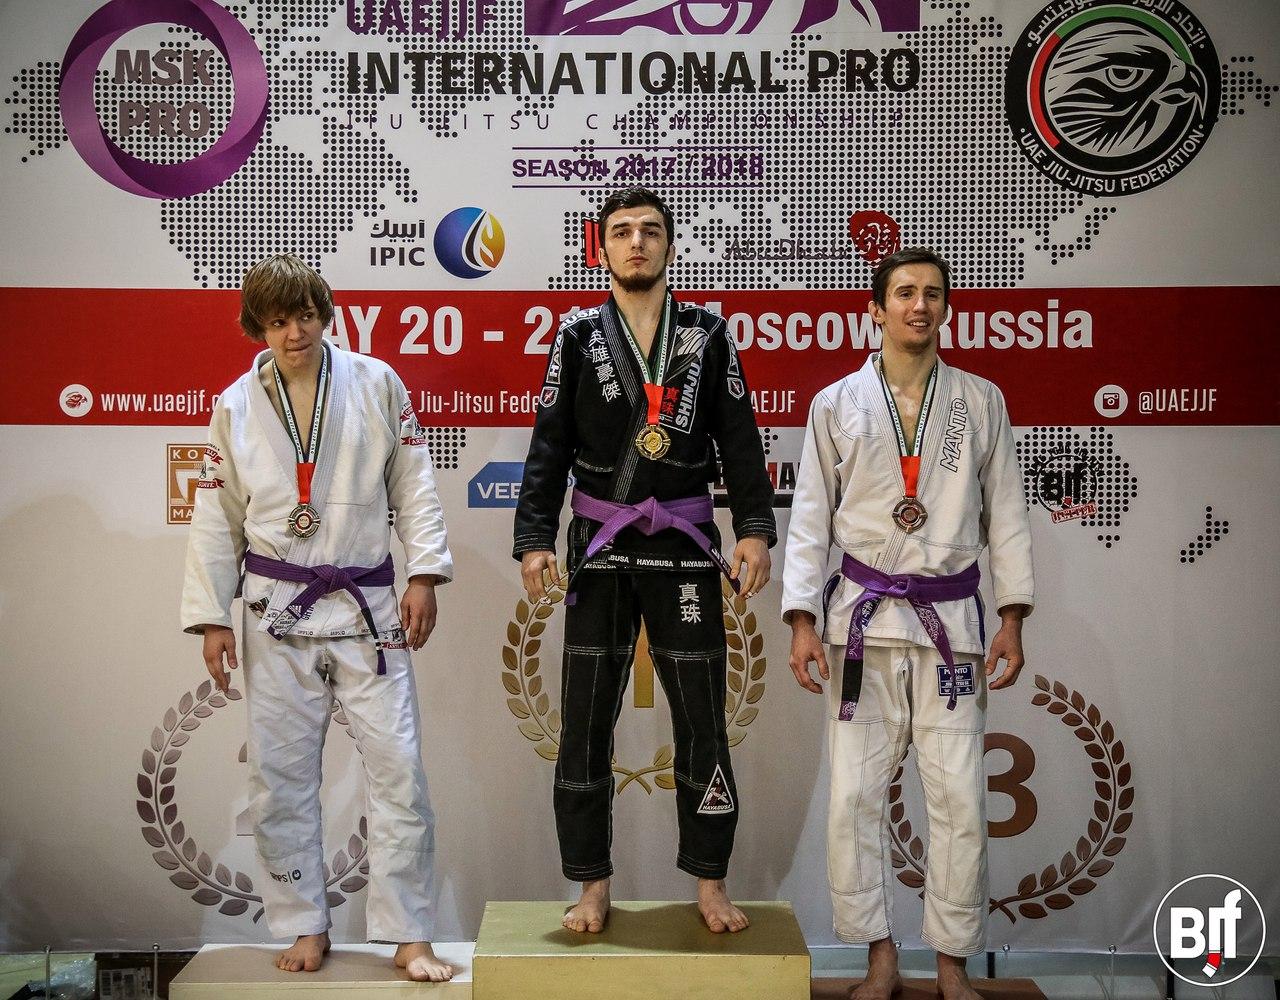 UAEJJF Internatioan Pro Moscow